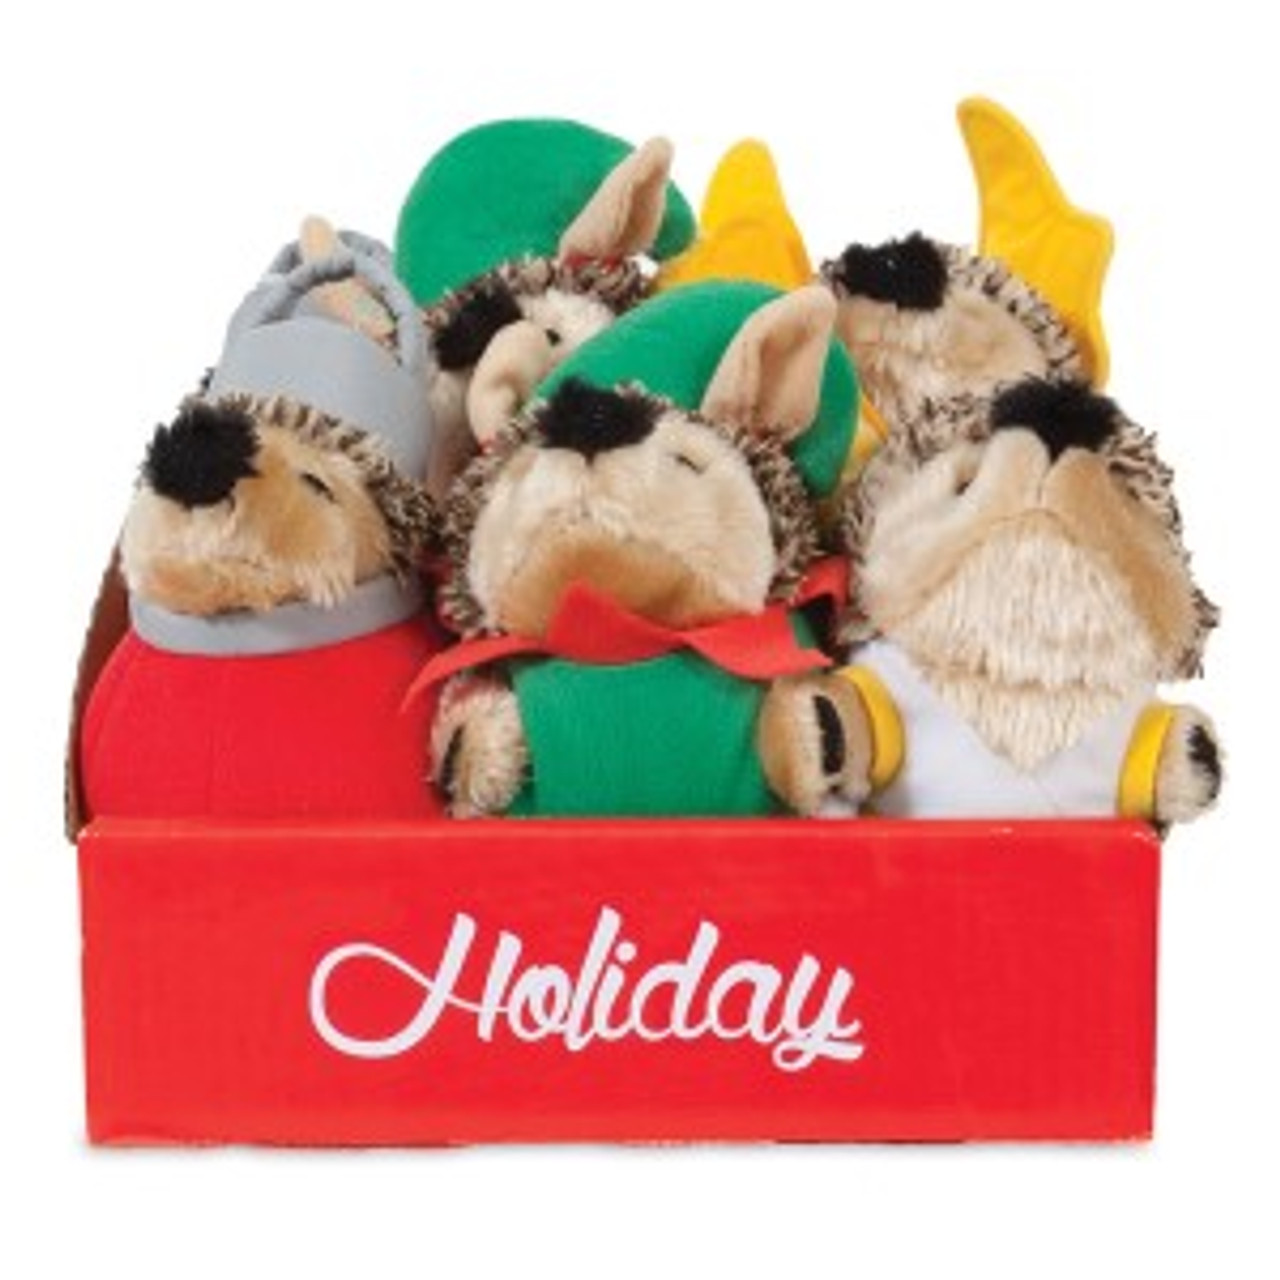 Petmate Grunting Hedgehog Dog Toys Little Red Heggie